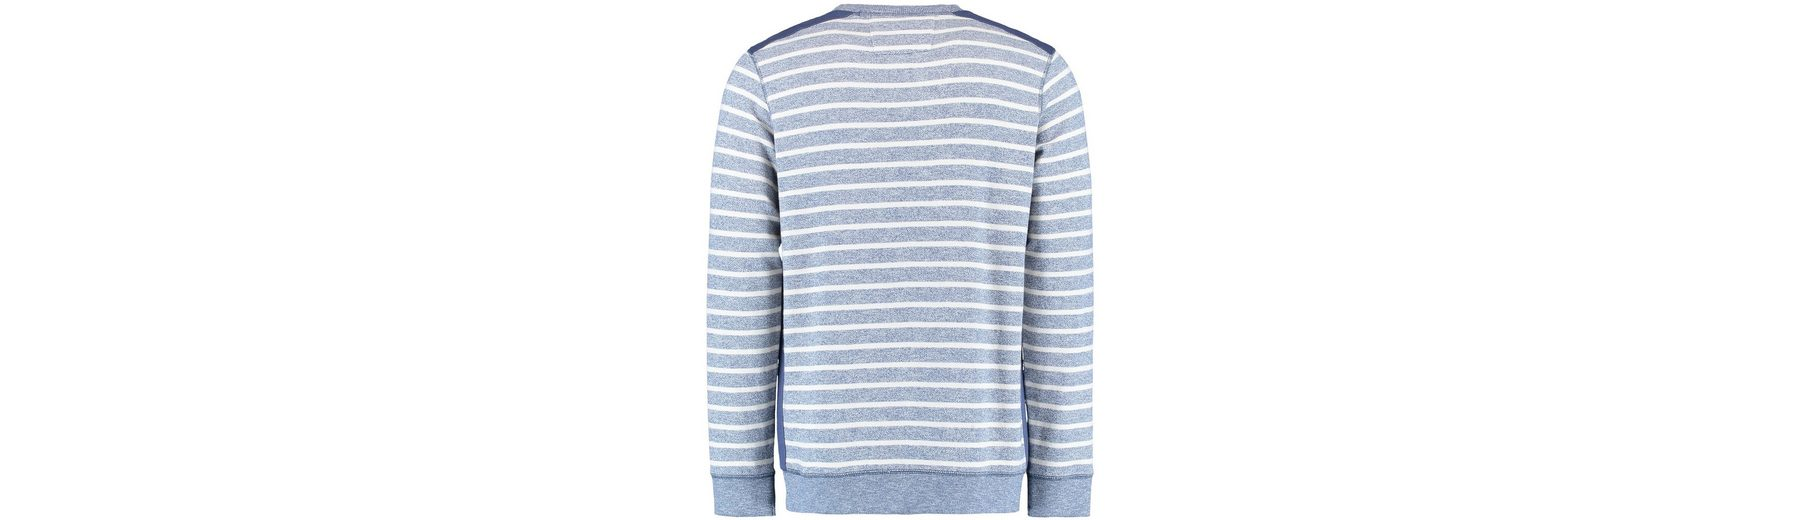 Footlocker Finish O'Neill Sweats Marin sweatshirt Eastbay Günstig Online Billige Visum Zahlung 1CKpD